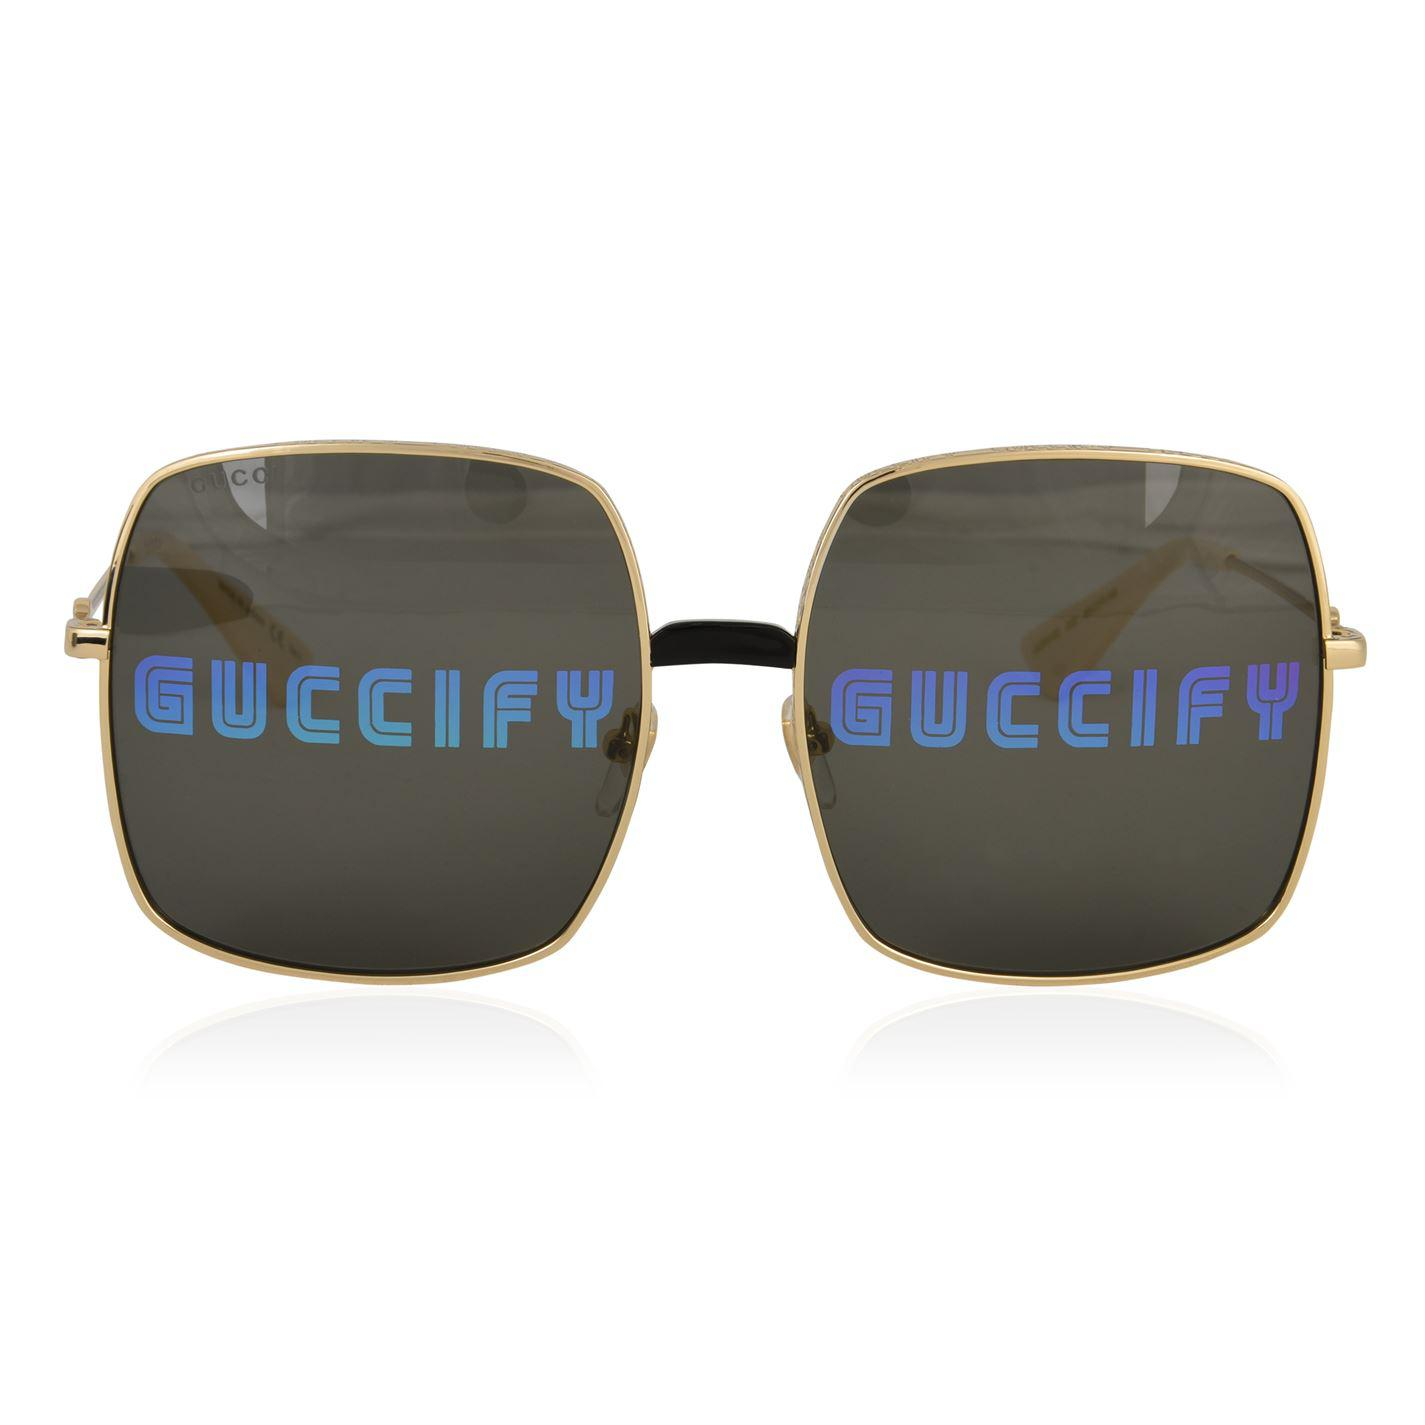 c675b262be8 Gucci. Women s Rectangular Frame Metal Sunglasses